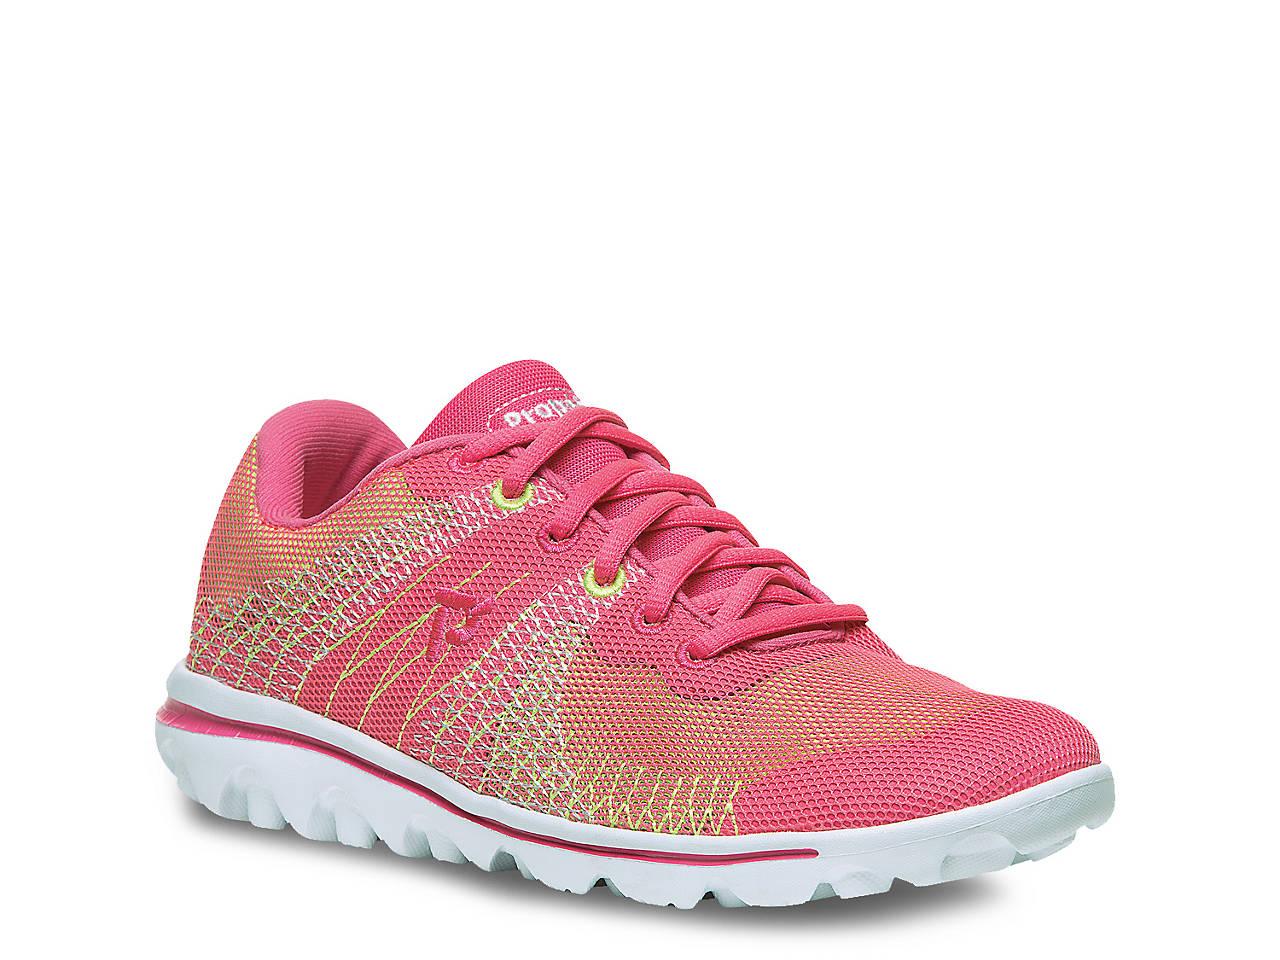 26429f1fbb32 Propet TravelActiv Knit Walking Shoe - Women s Women s Shoes